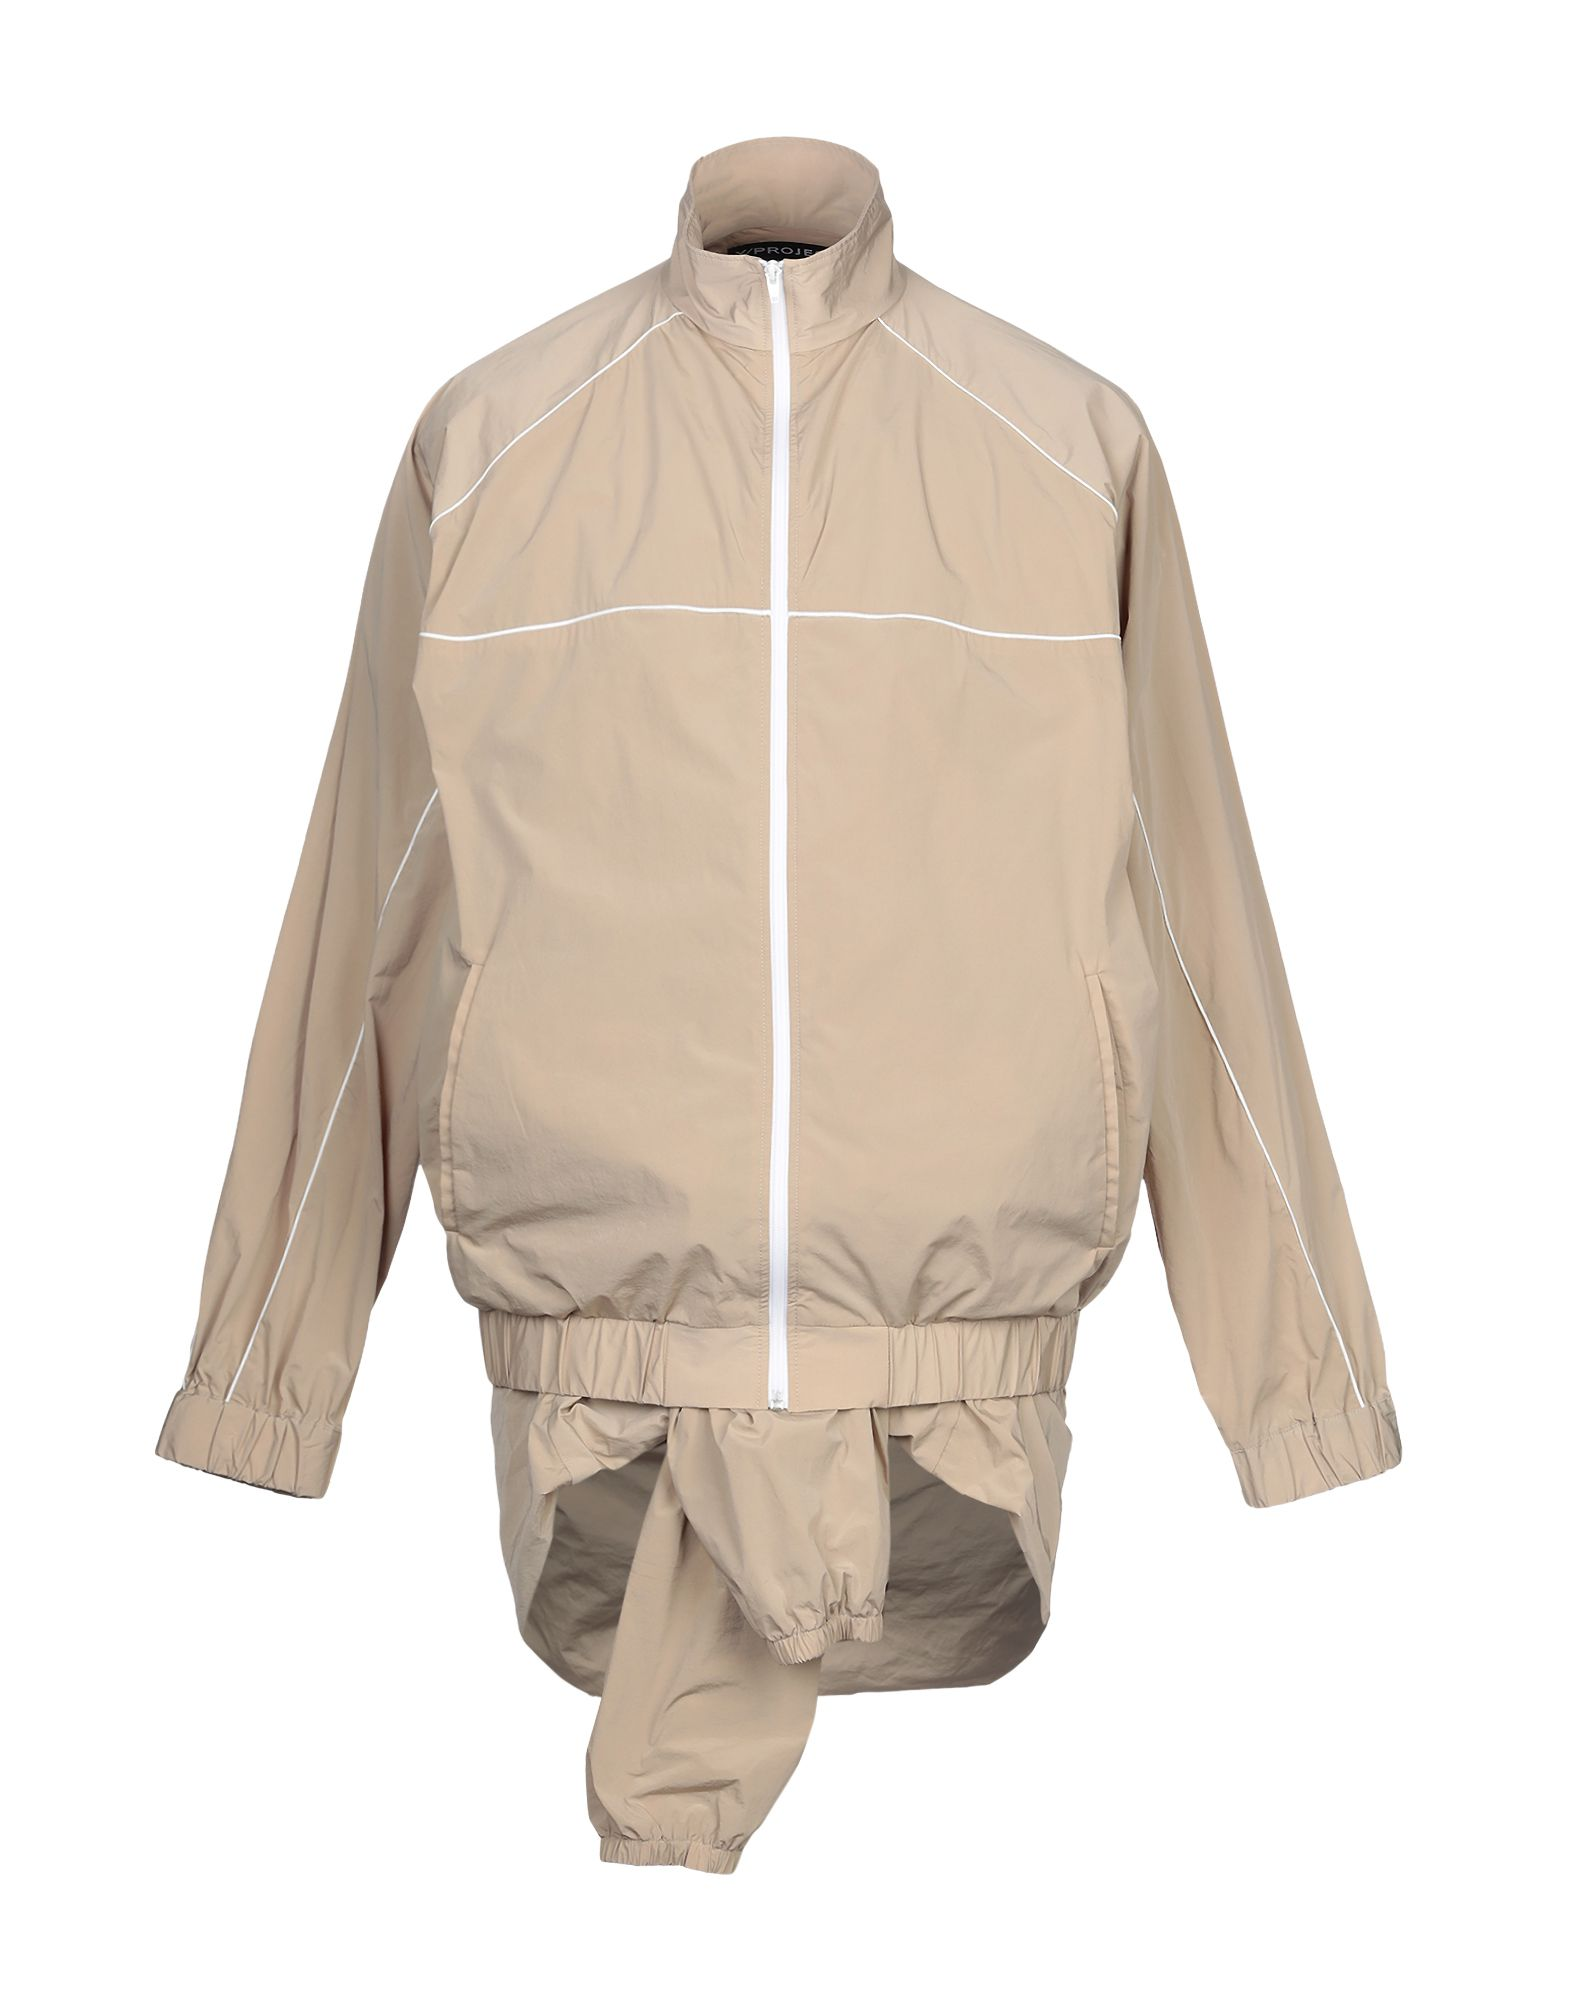 Фото - Y/PROJECT Куртка project [foce] singleseason куртка